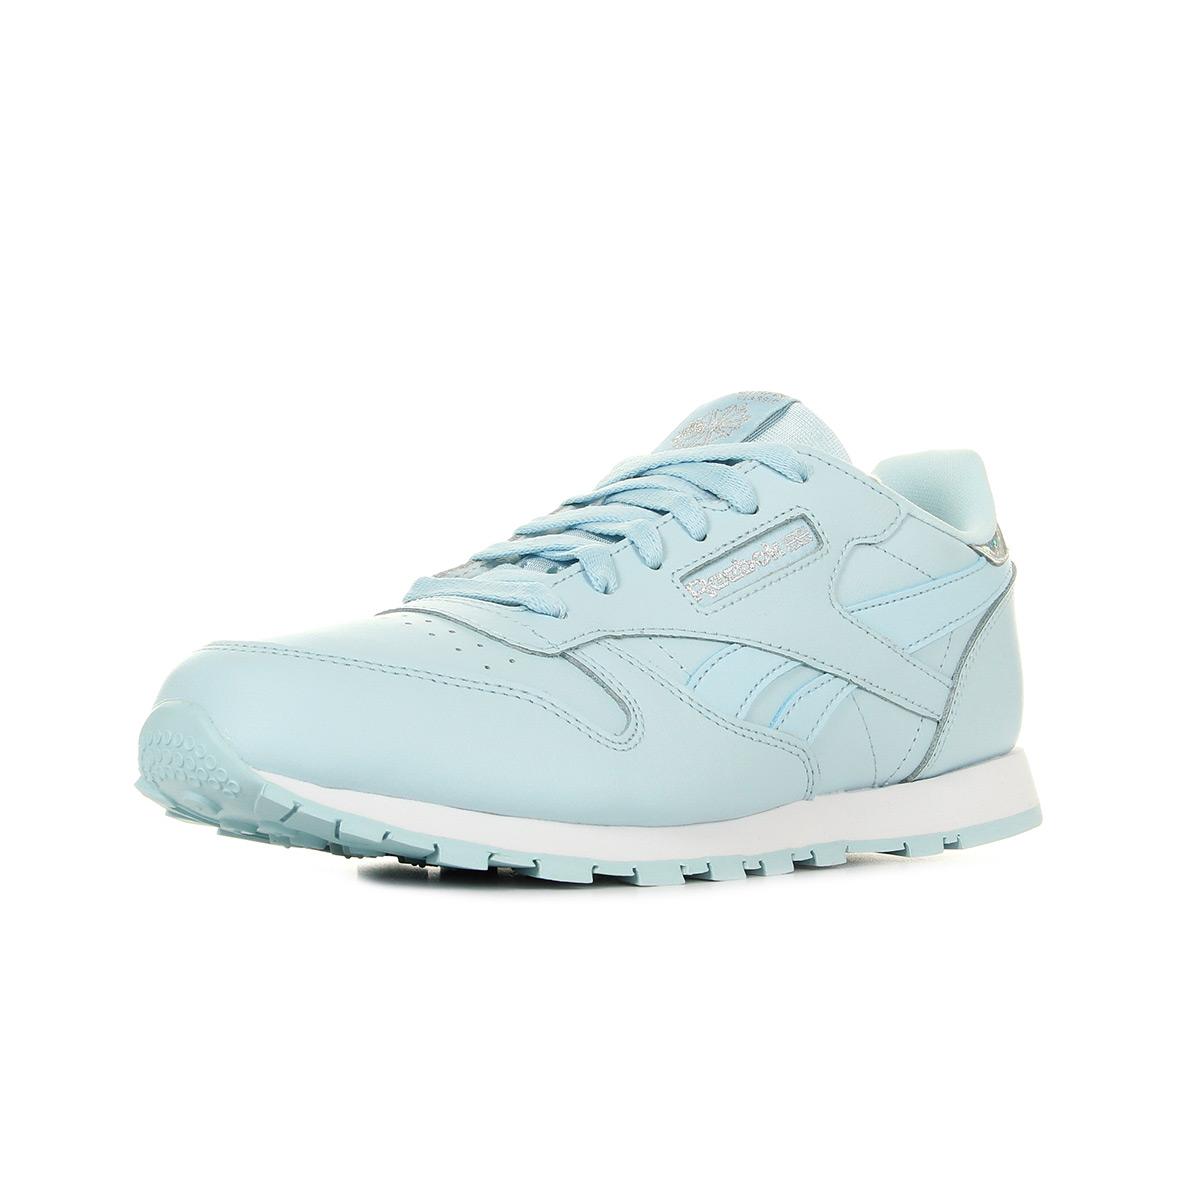 Chaussures Baskets Reebok femme Classic Leather Pastel taille Bleu clair Bleue